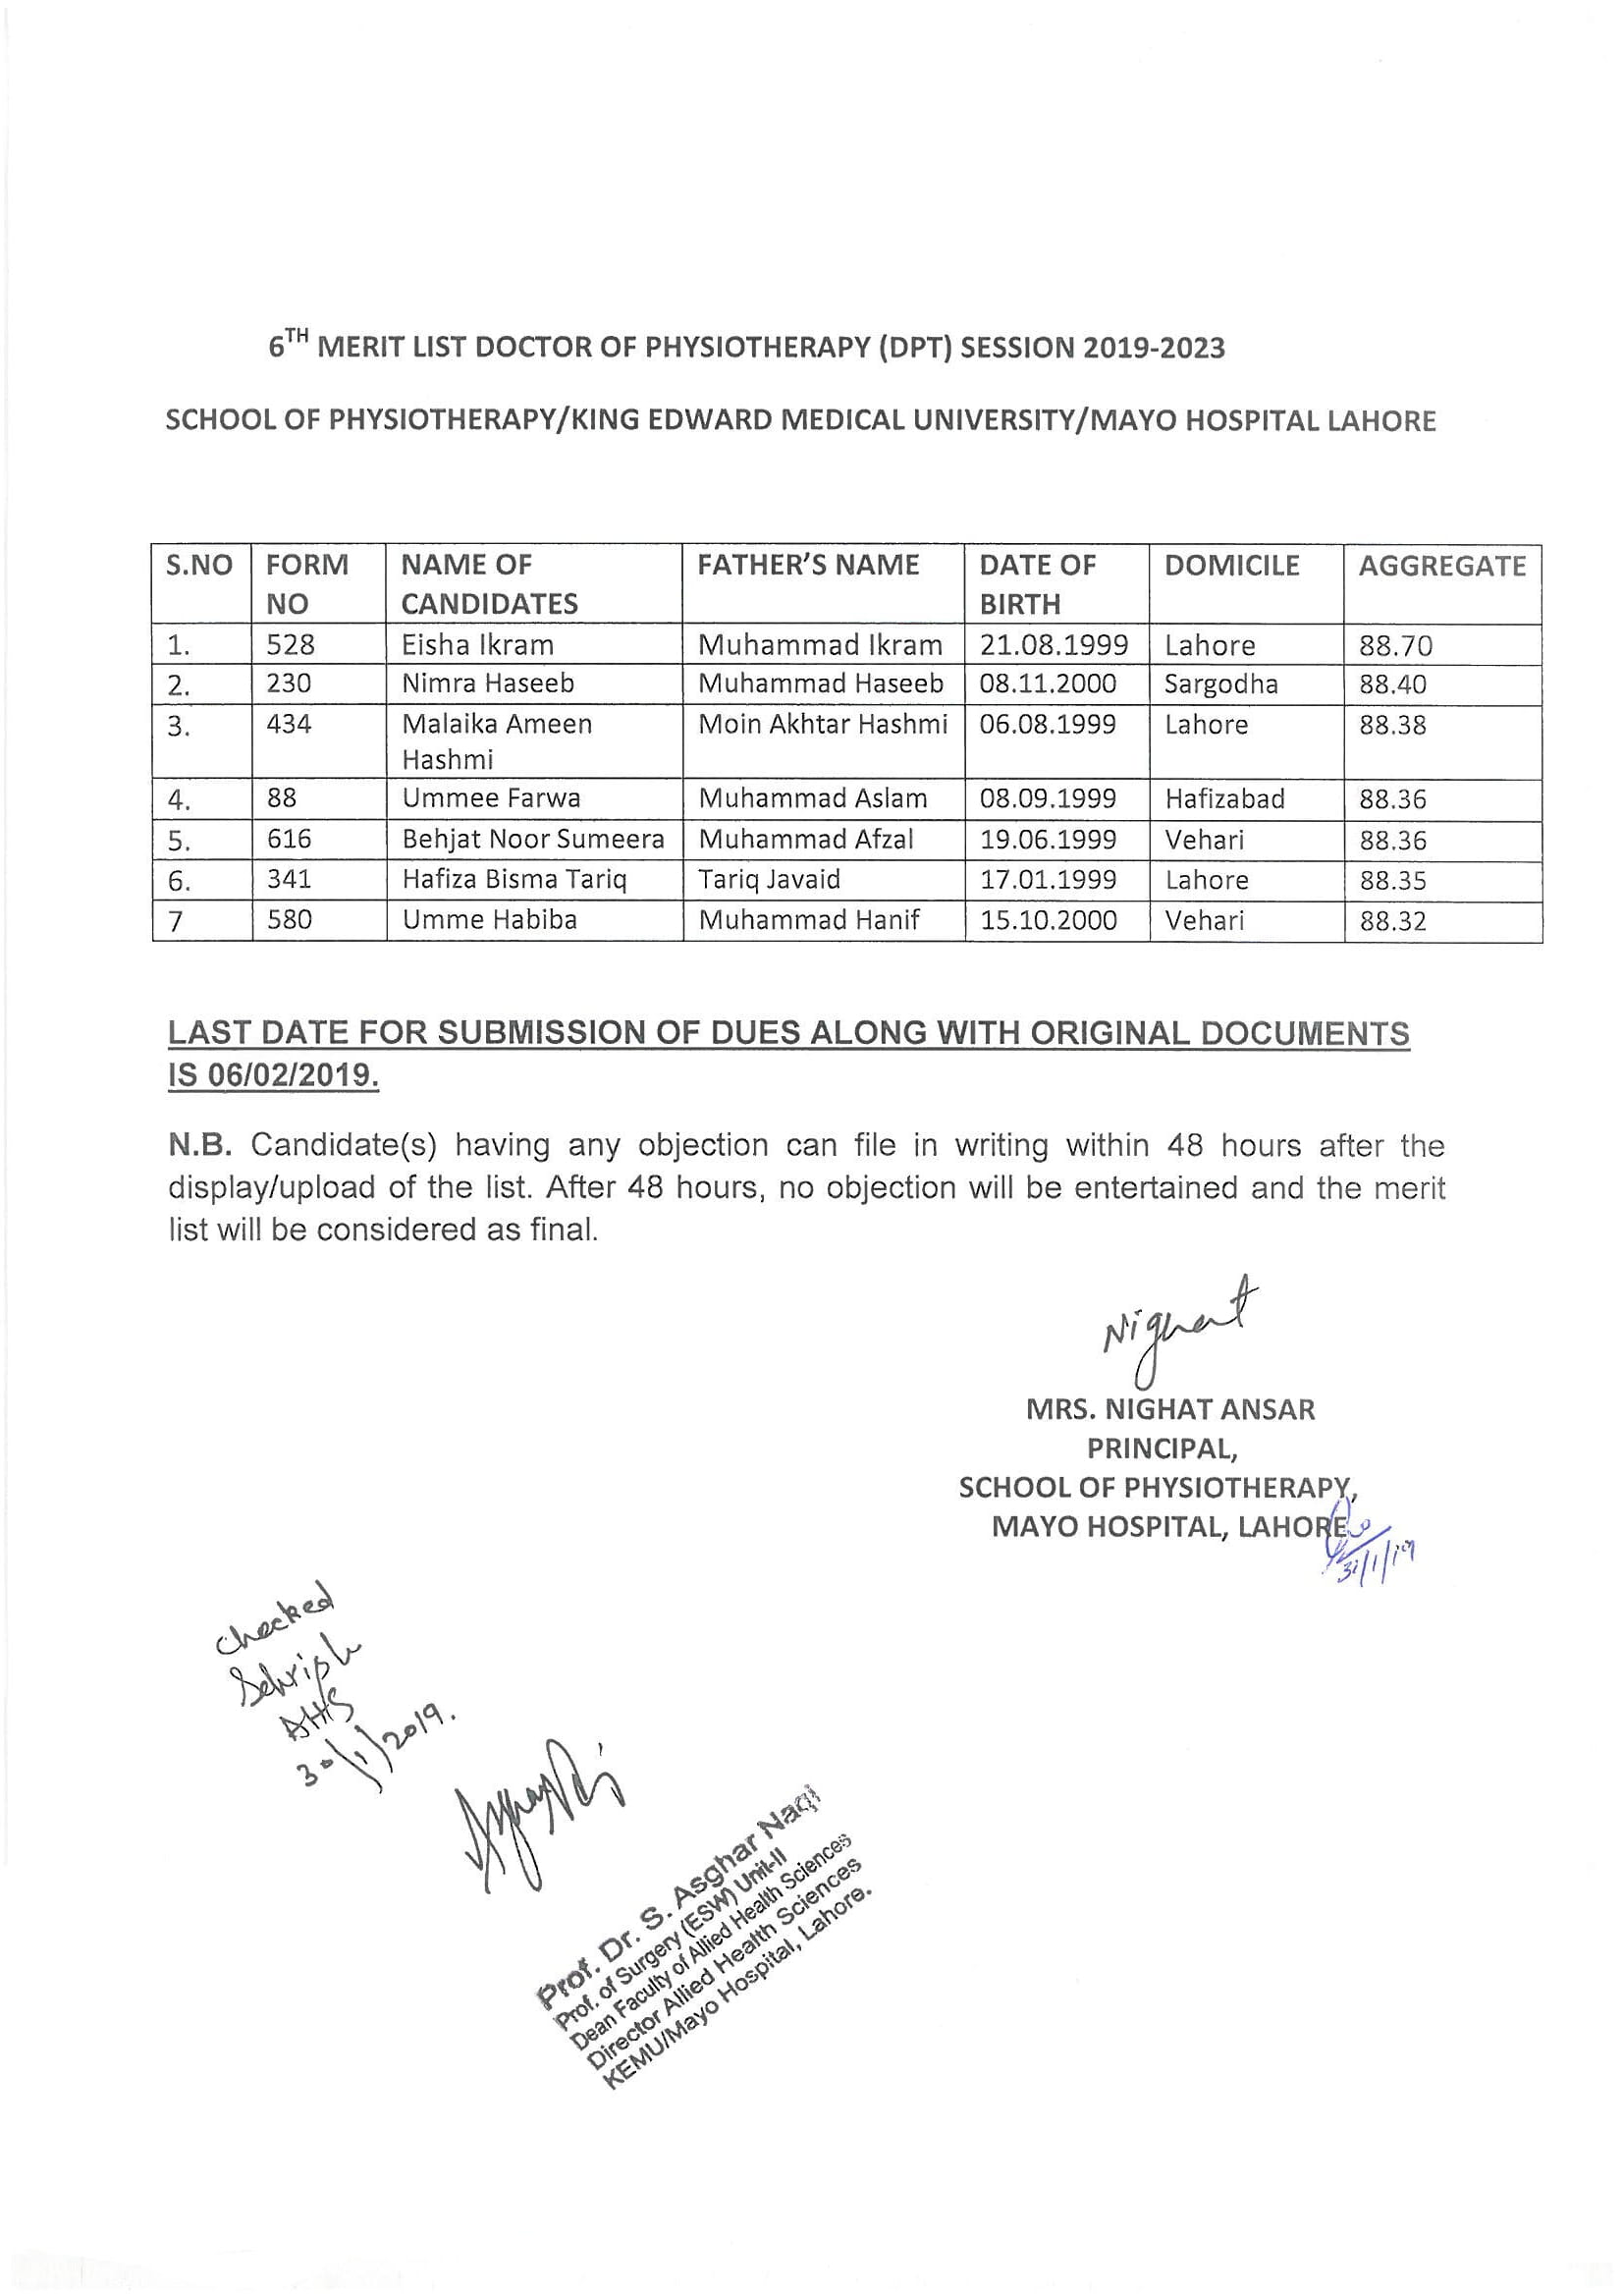 6th Merit List DPT at King Eward Medical University, Lahore 2019